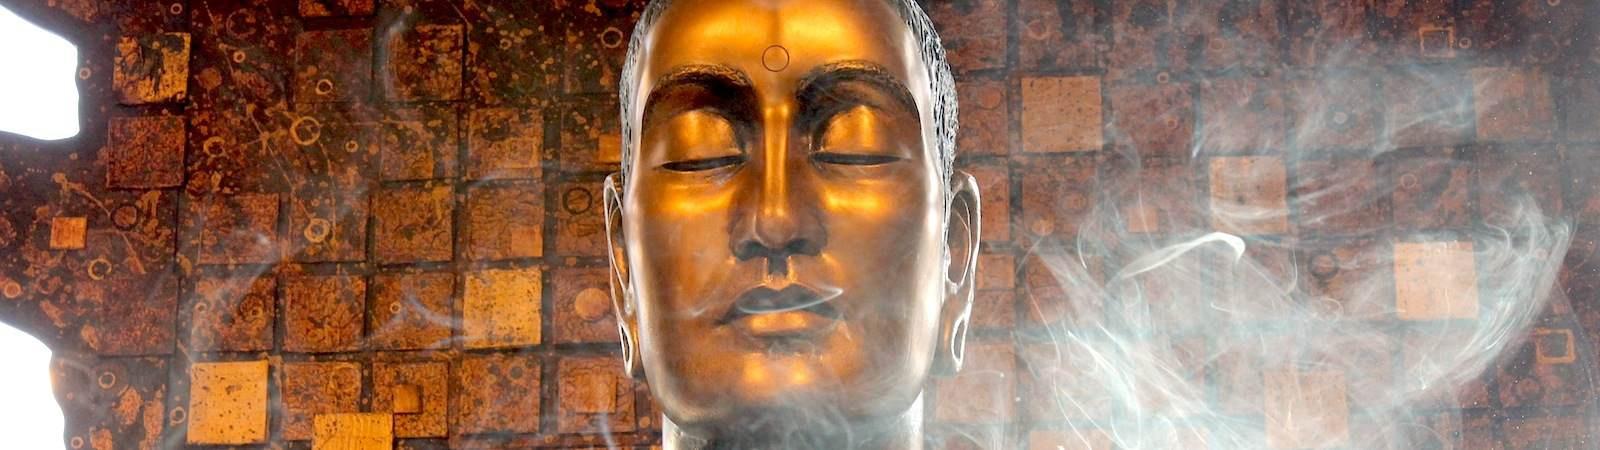 The Padmaloka Rupa by Aloka